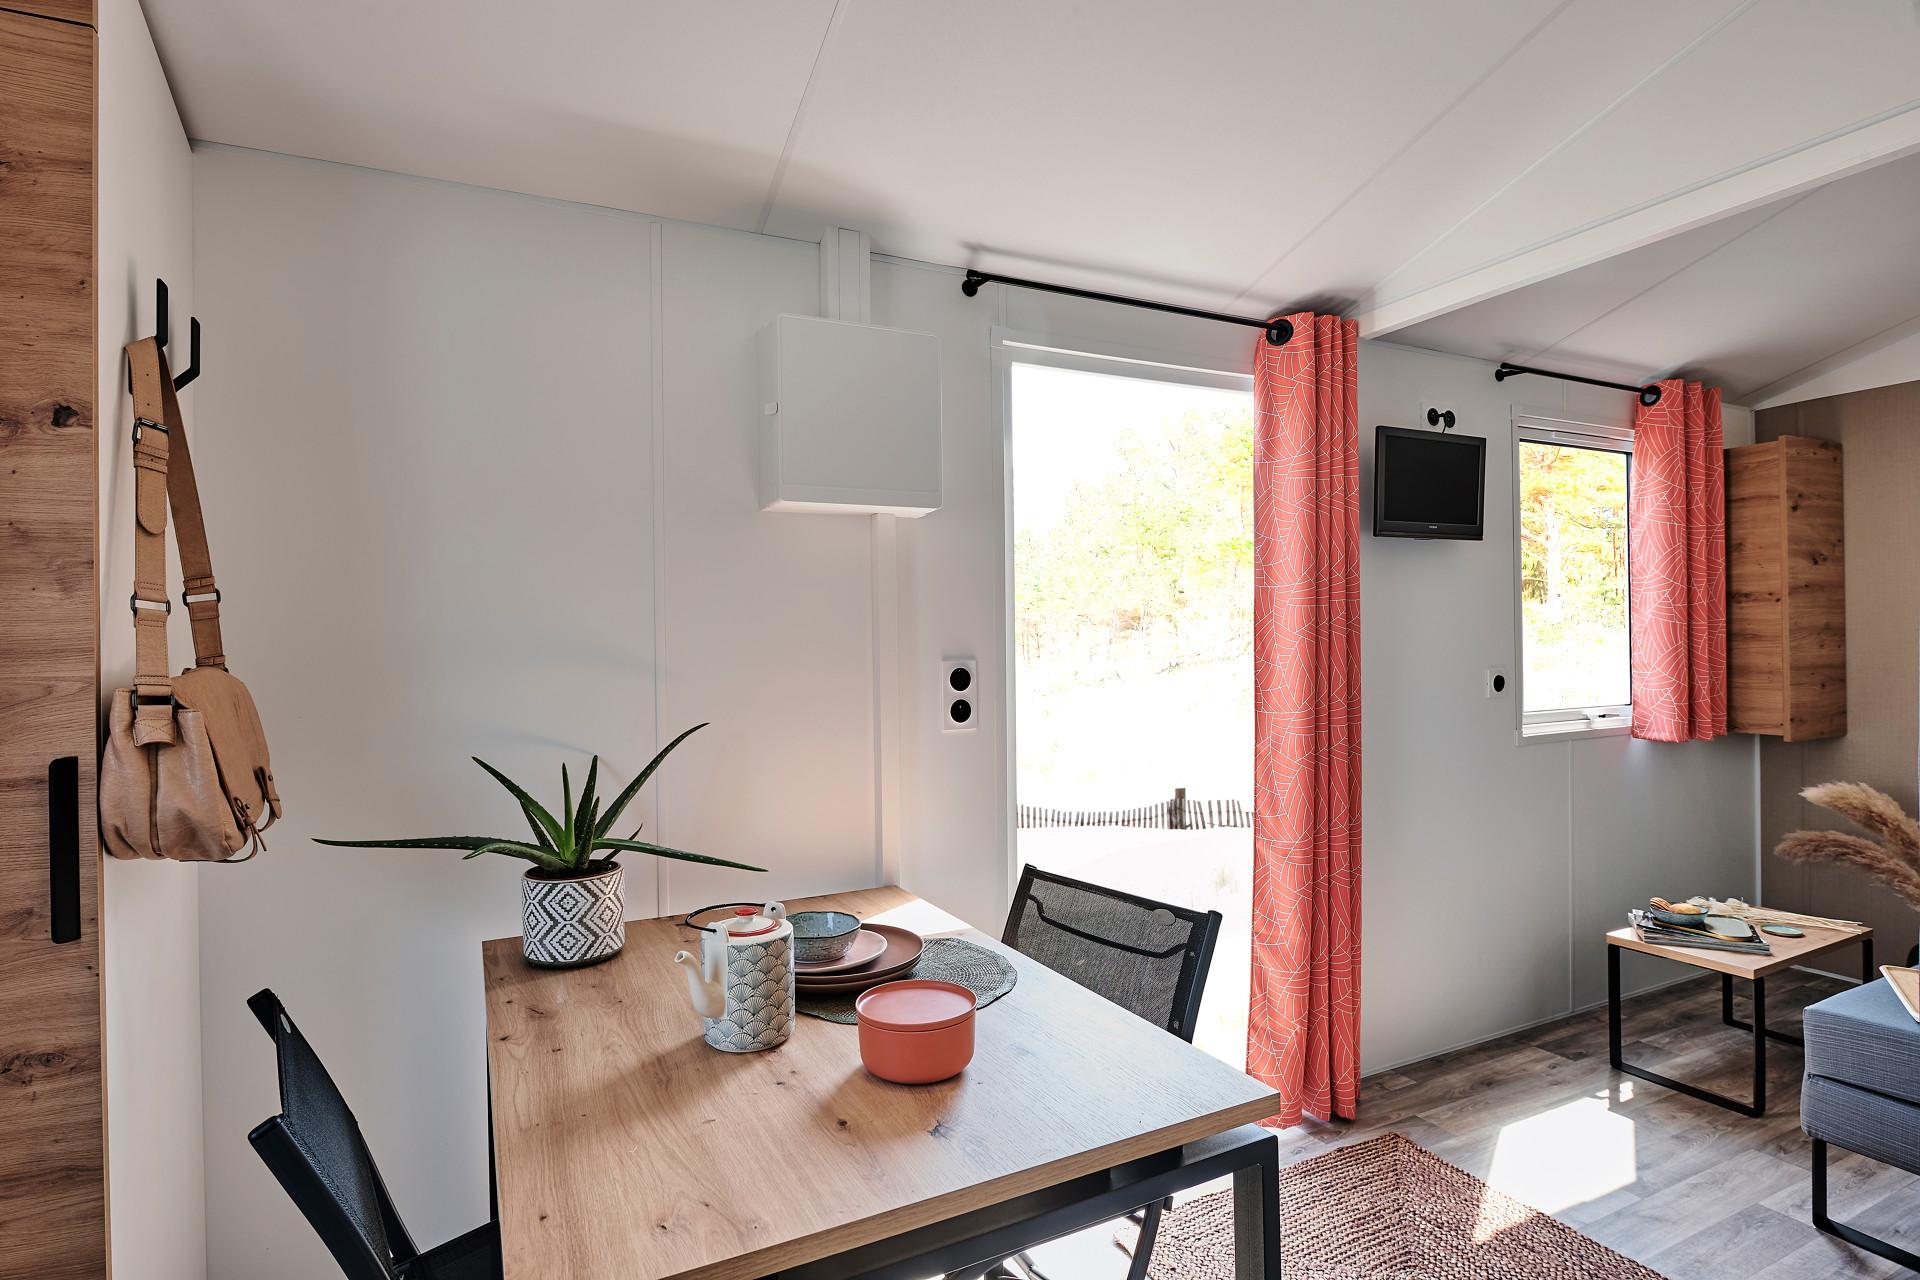 Mobil-home Premium 19m² (1 chambre) + Lave-vaisselle + Lit 160 + Terrasse semi-couverte 11m²